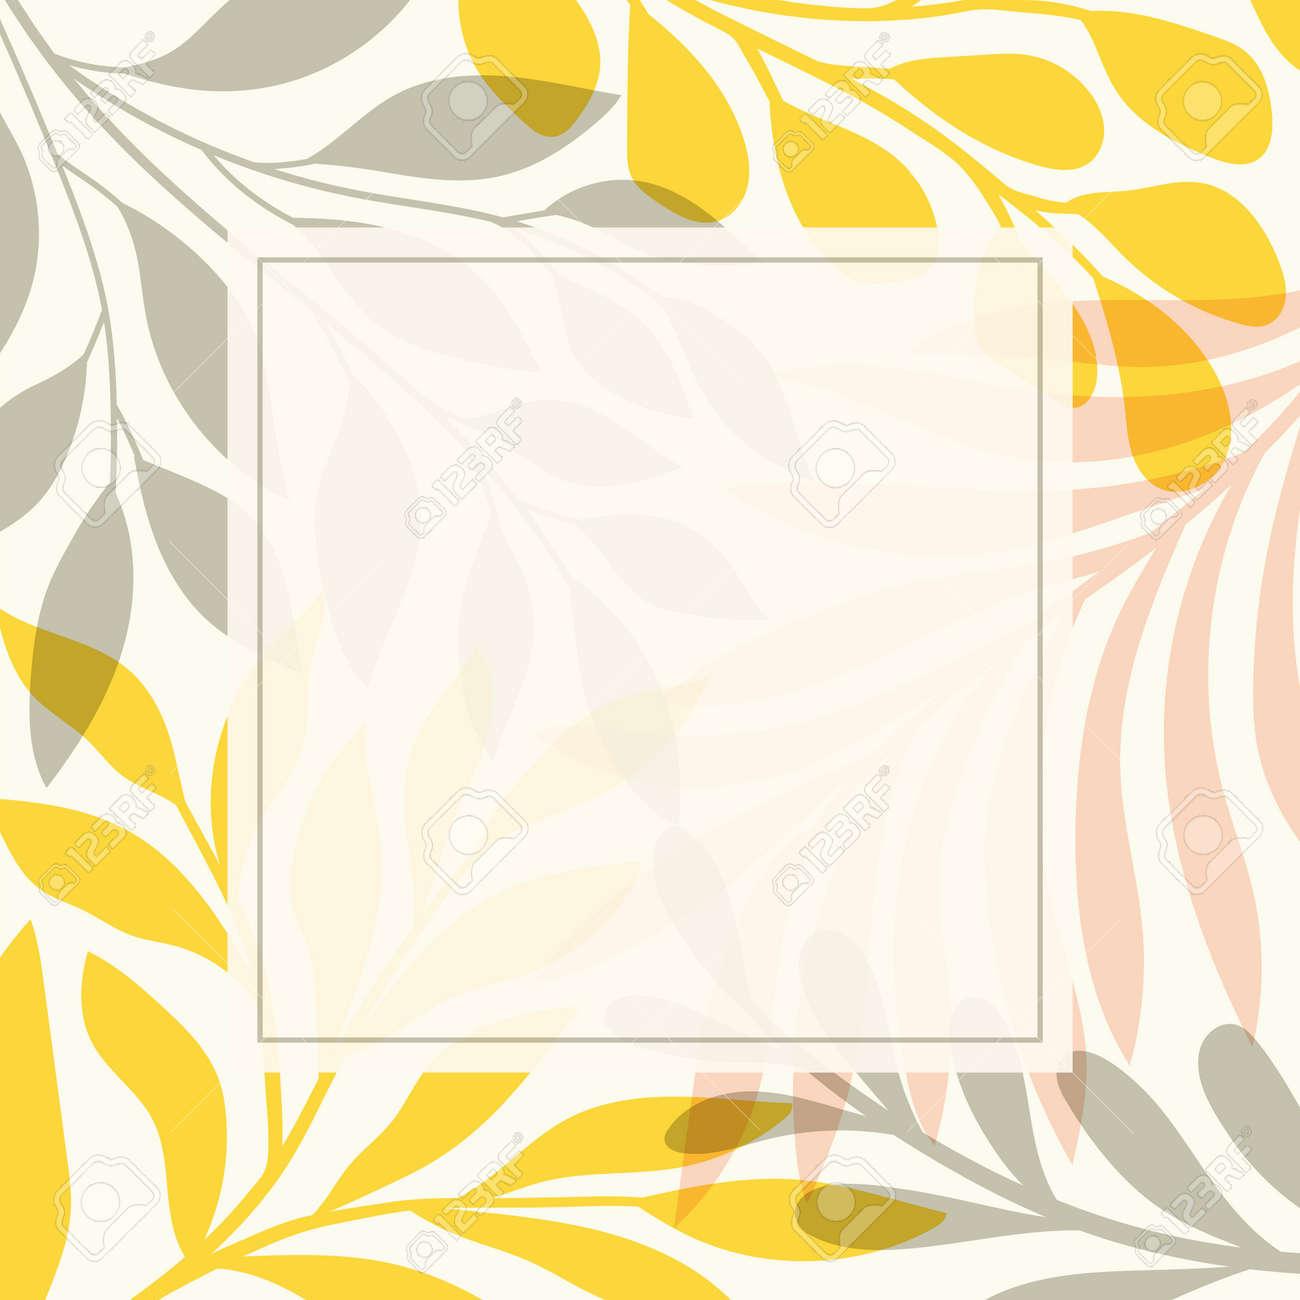 Modern floral vector banner. Botanical illustration template background. Abstract plant elements for print design, social media, post banner and presentation. - 168265315